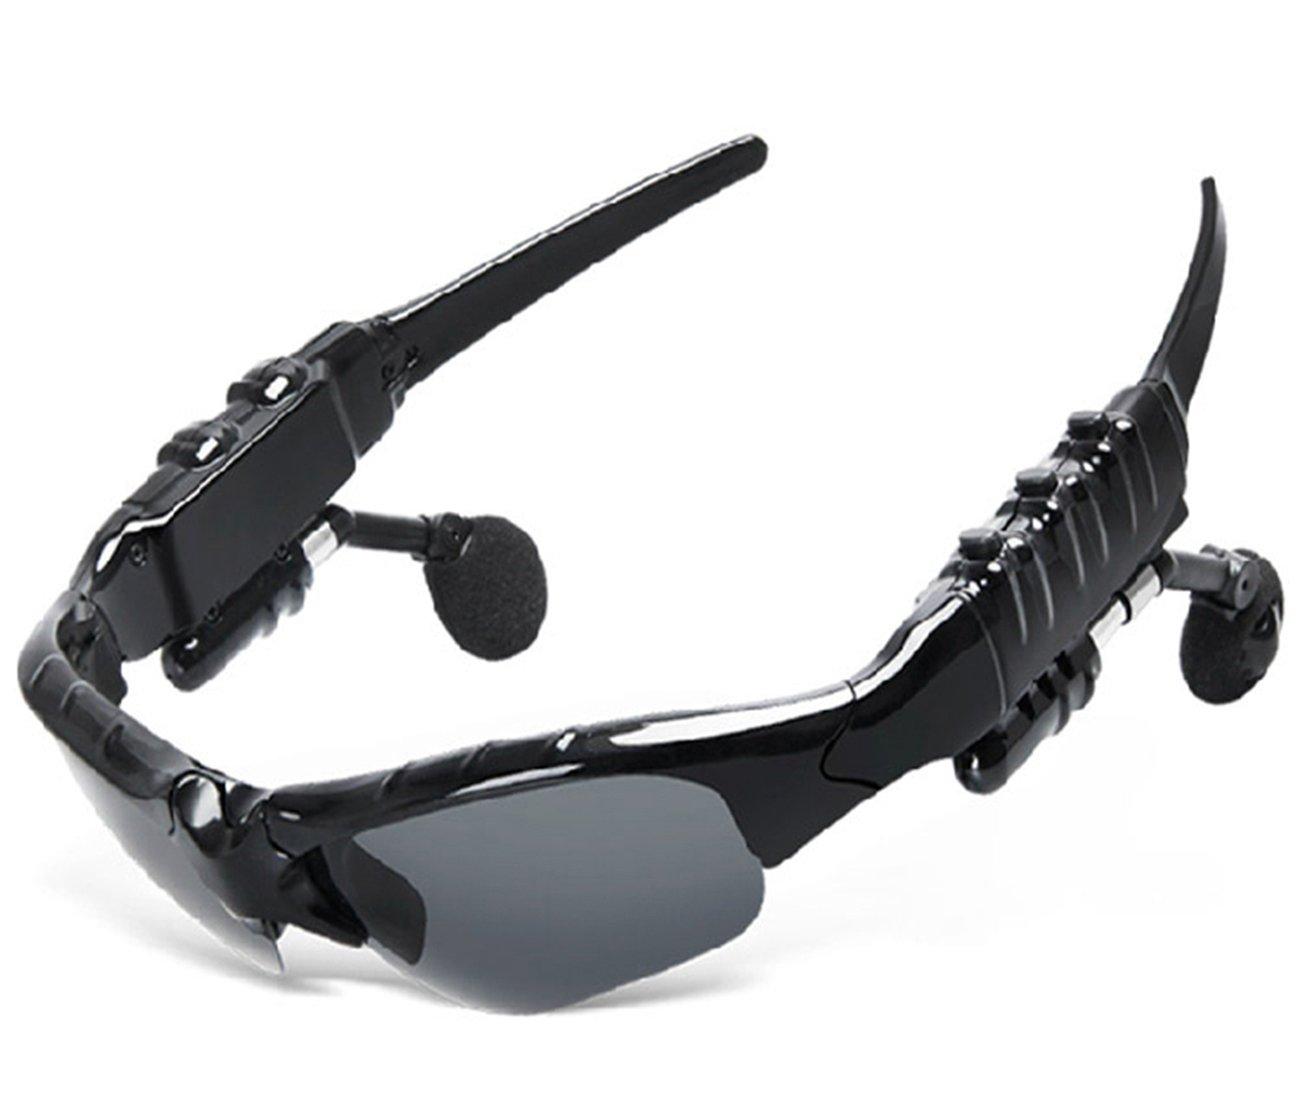 Bluetooth多機能ステレオsunglasses-outdoor車使用ハンズフリー音声インテリジェンスサングラス B073PWNF23